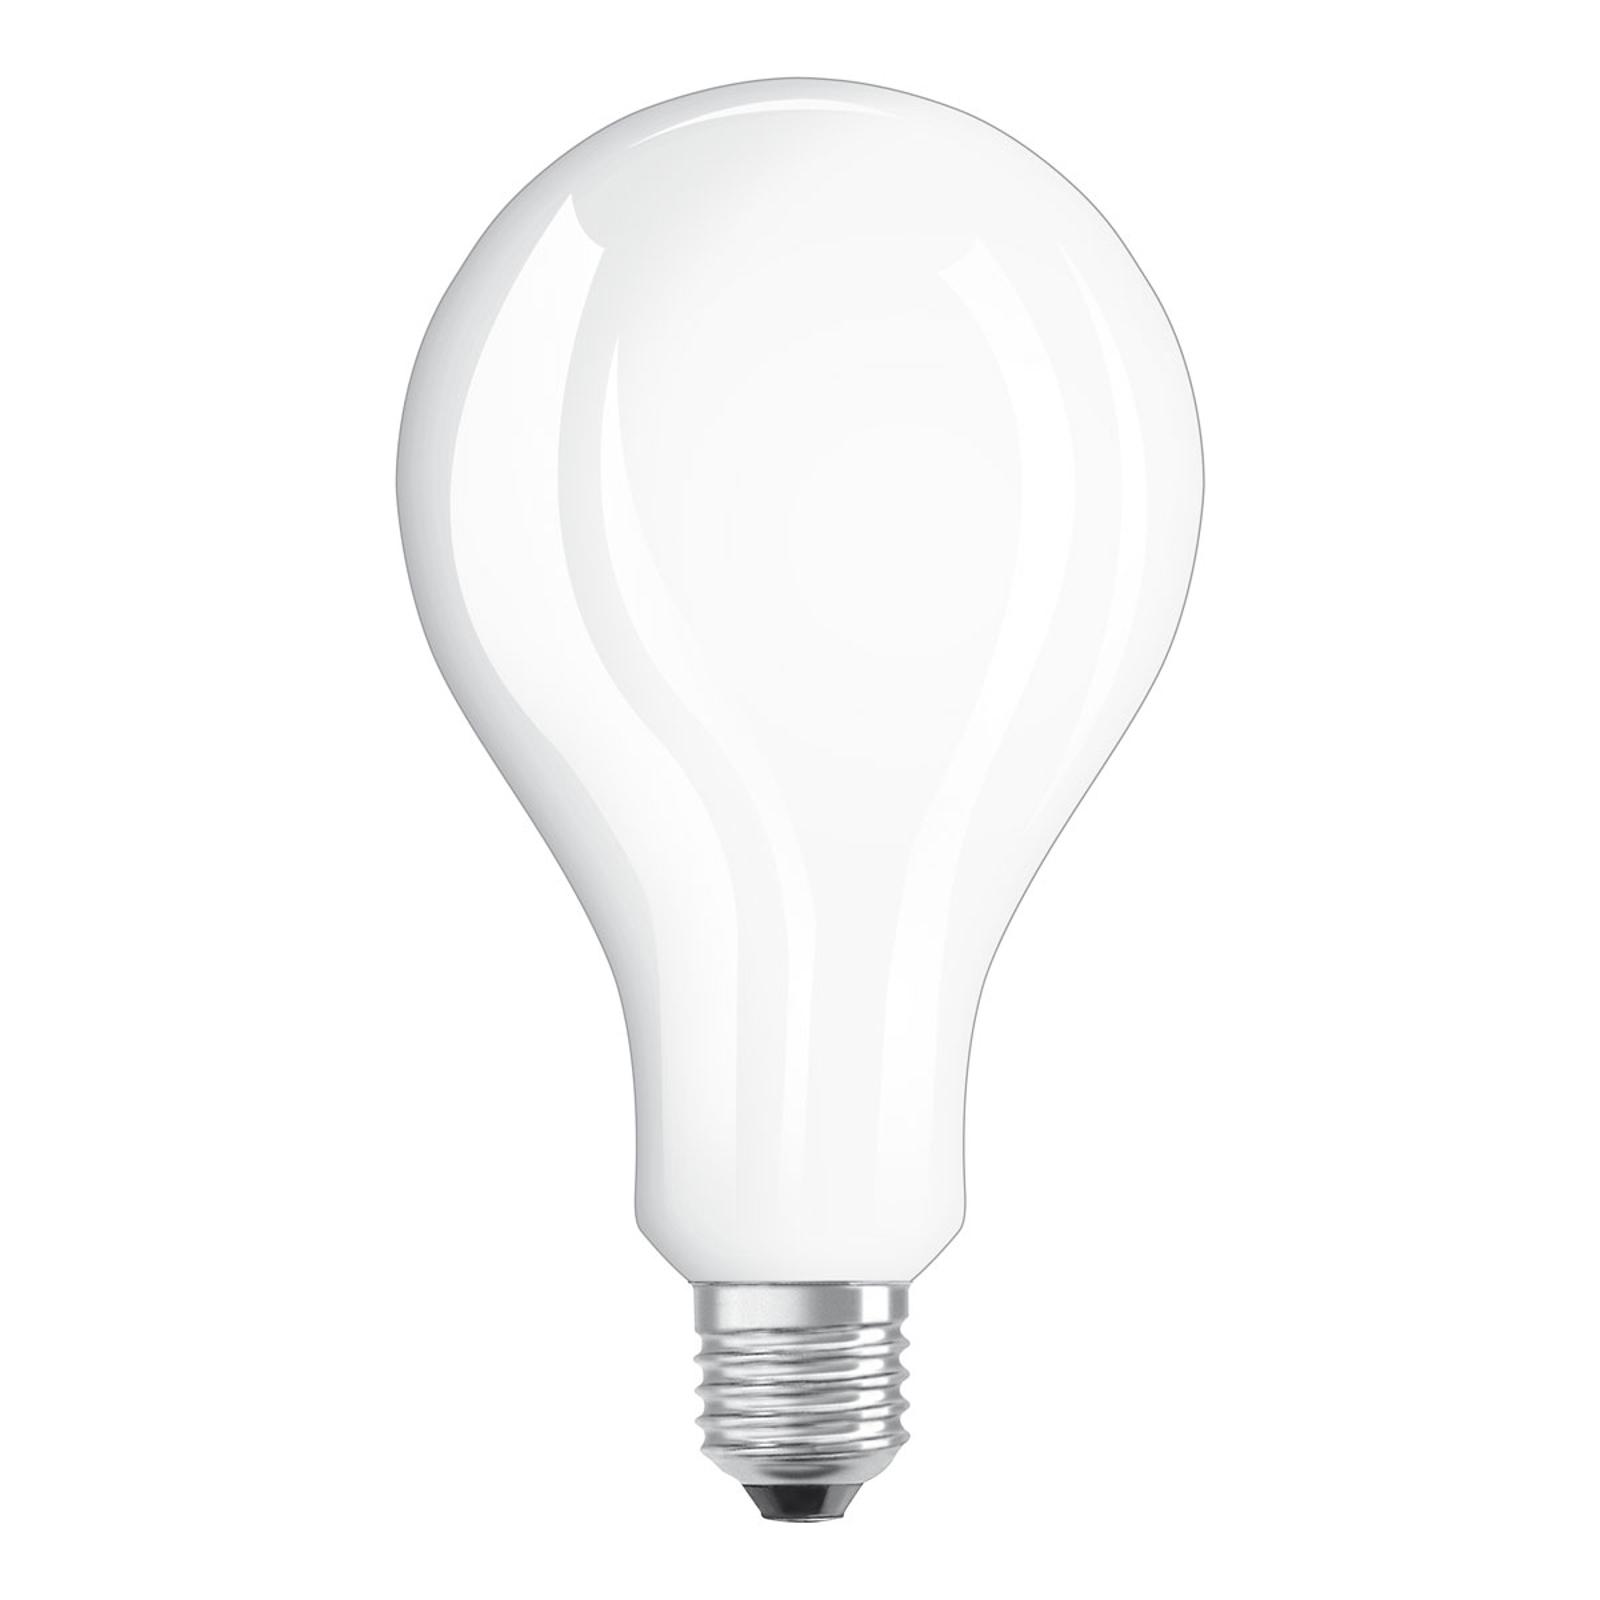 OSRAM-LED-lamppu E27 16W Classic A opaali 2 700 K